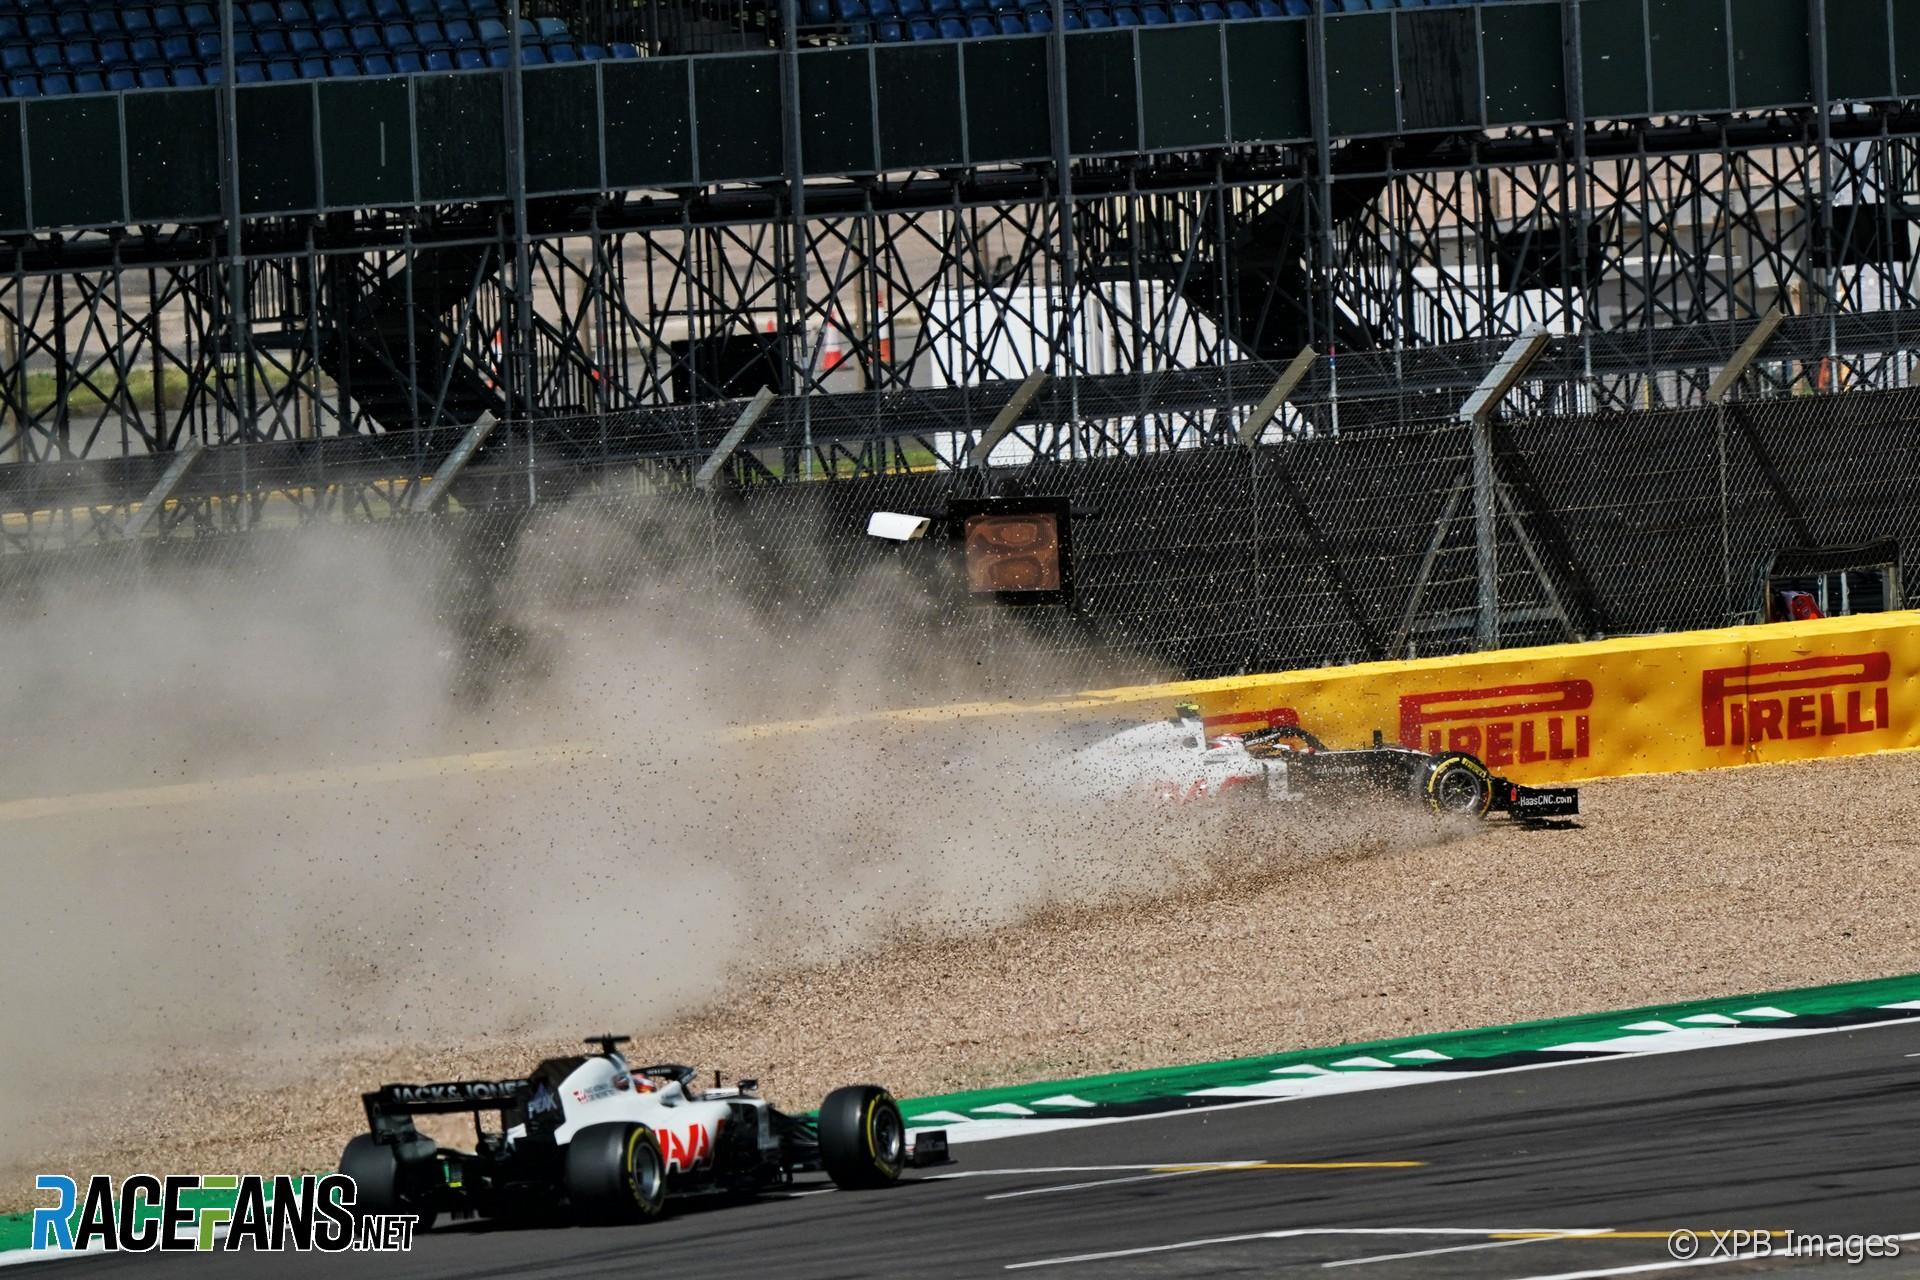 Kevin Magnussen, Haas, Silverstone, 2020